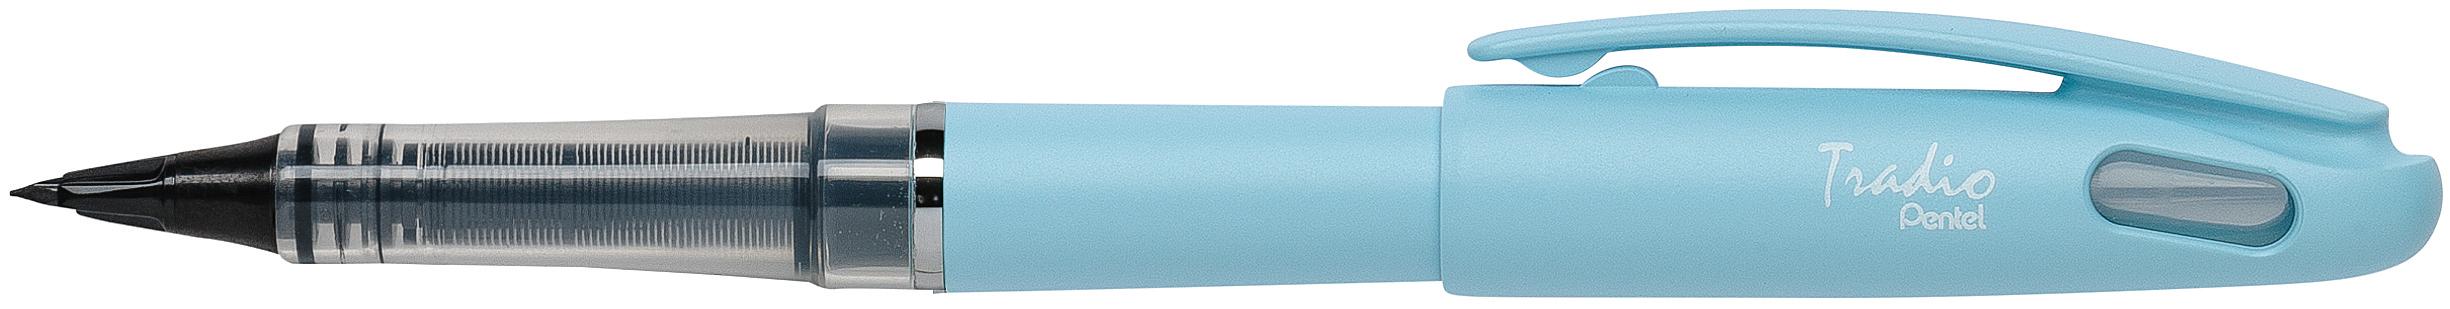 Pentel Tradio Pastel - Feutre plume - corps bleu